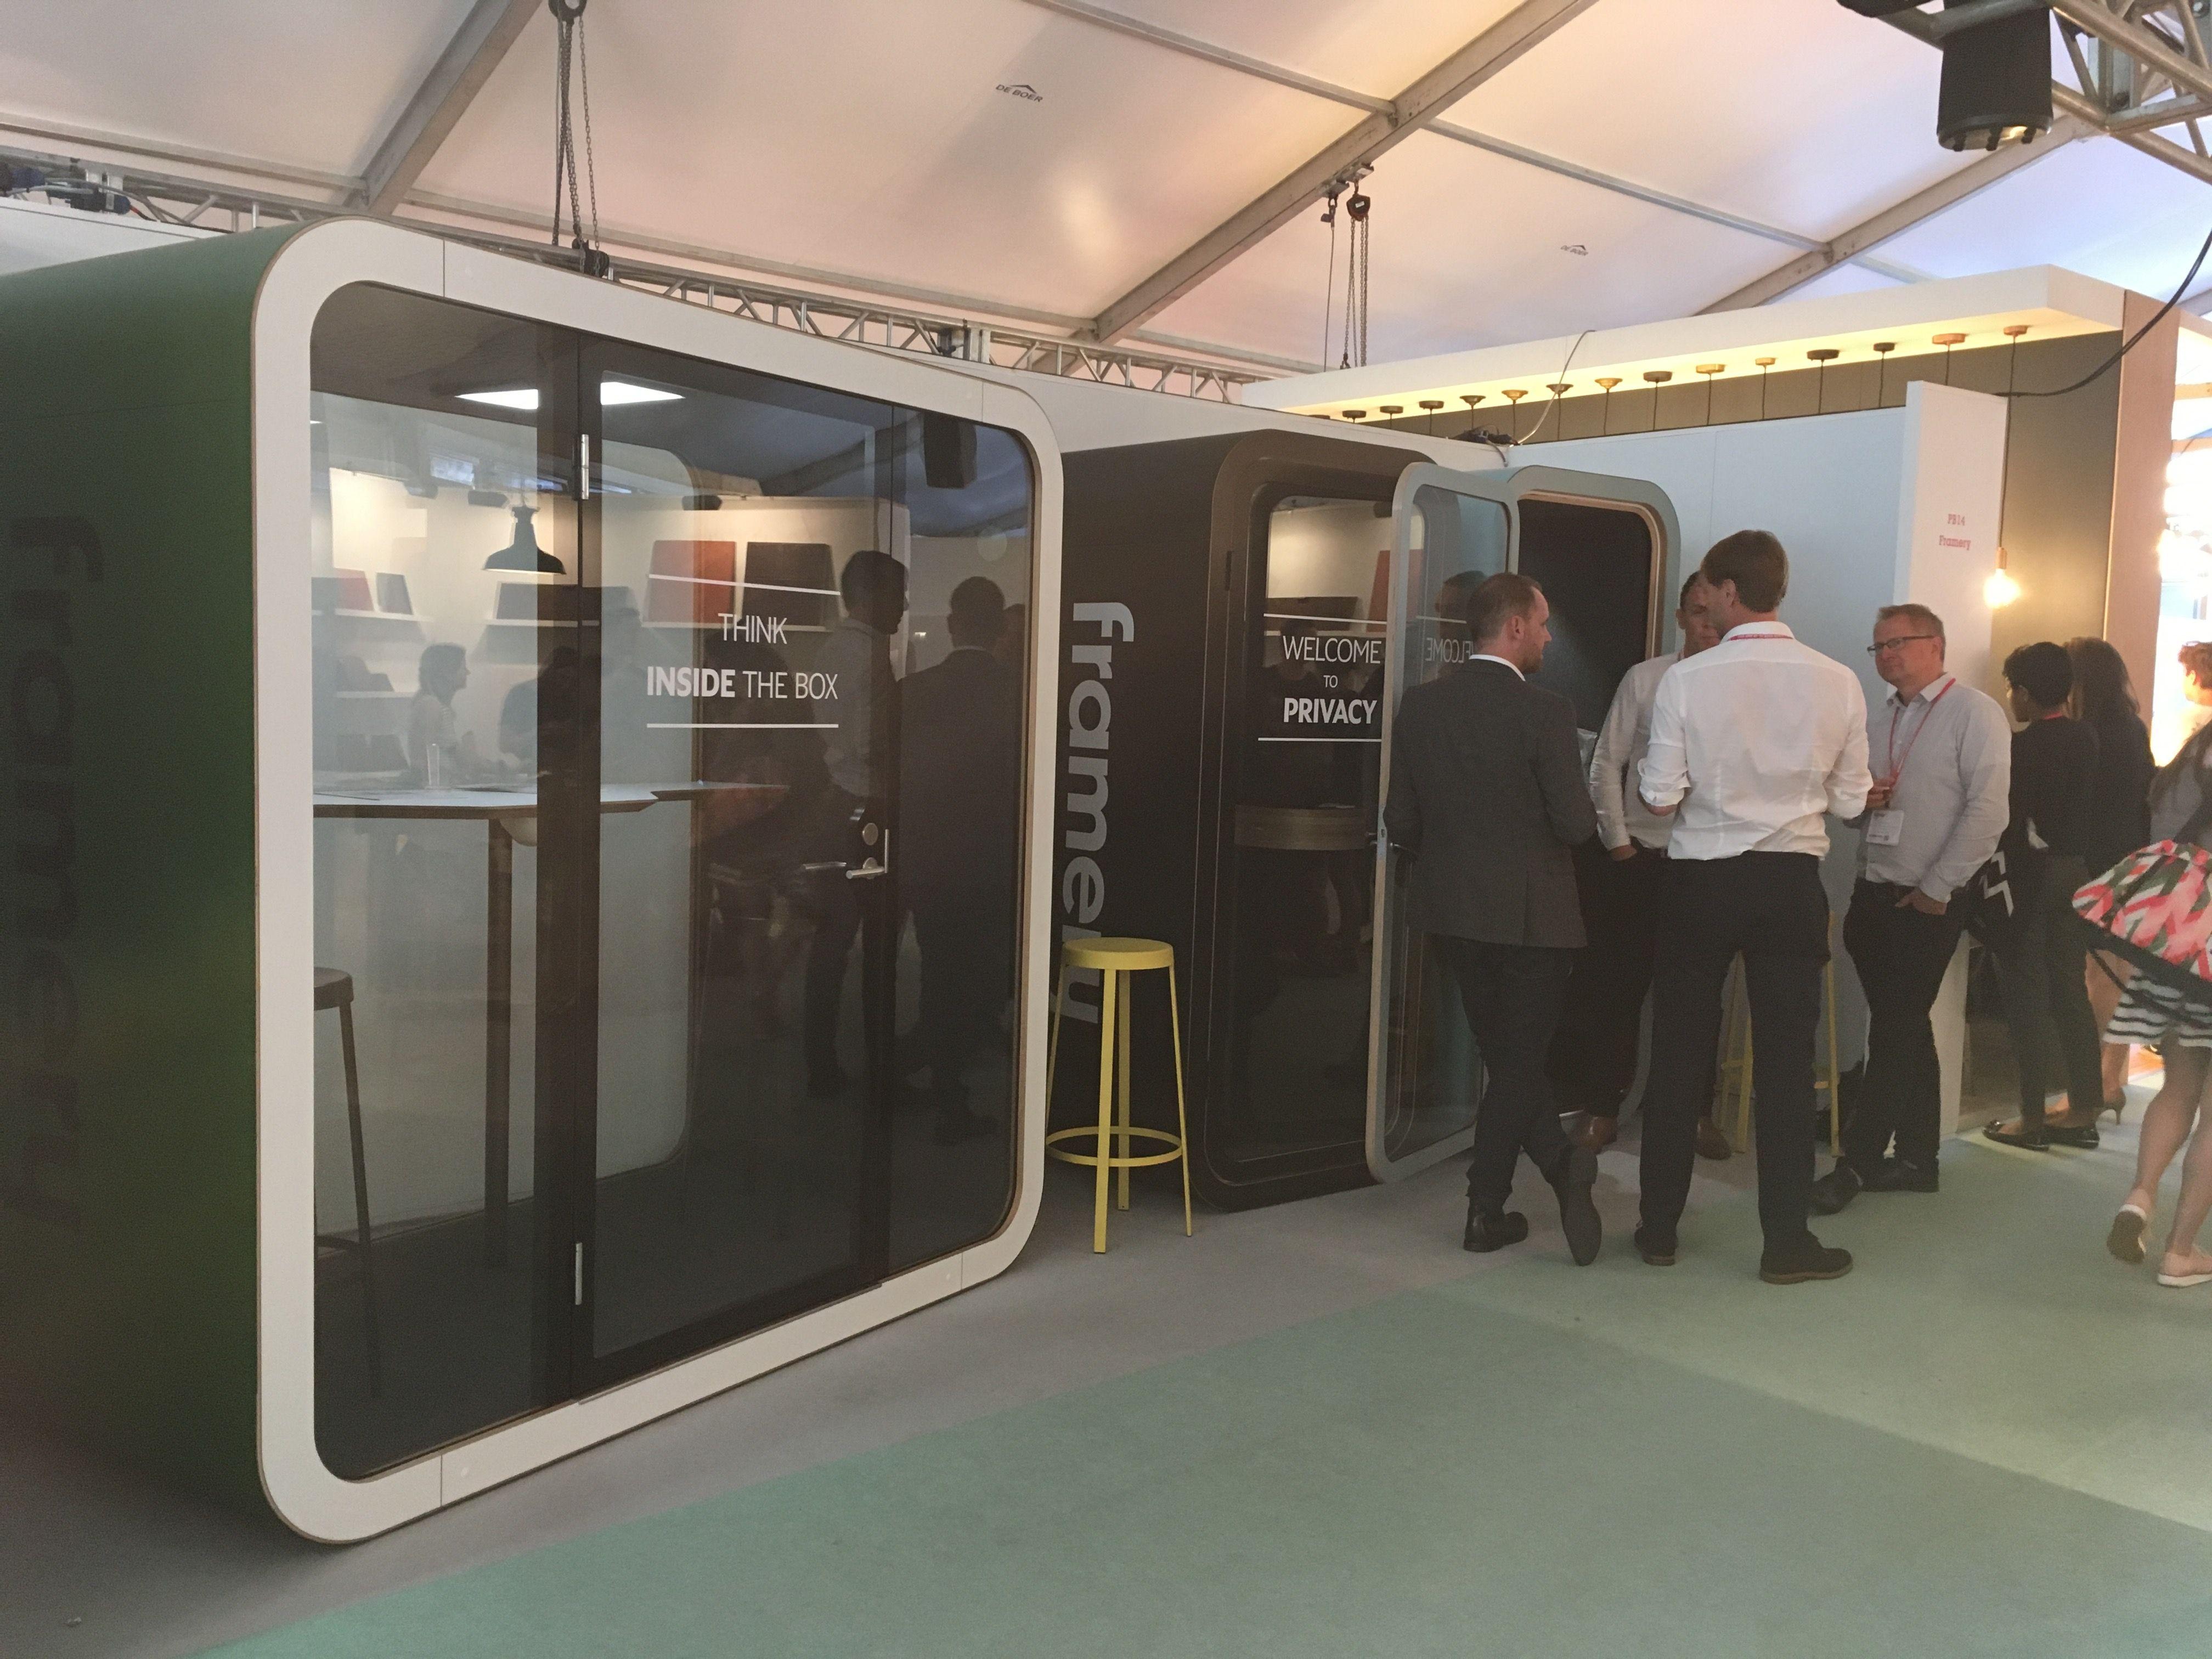 Framery Q Booth at Clerkenwell Design Week 2017 #CDW2017  #clerkenwelldesignweek #framery #frameryuk